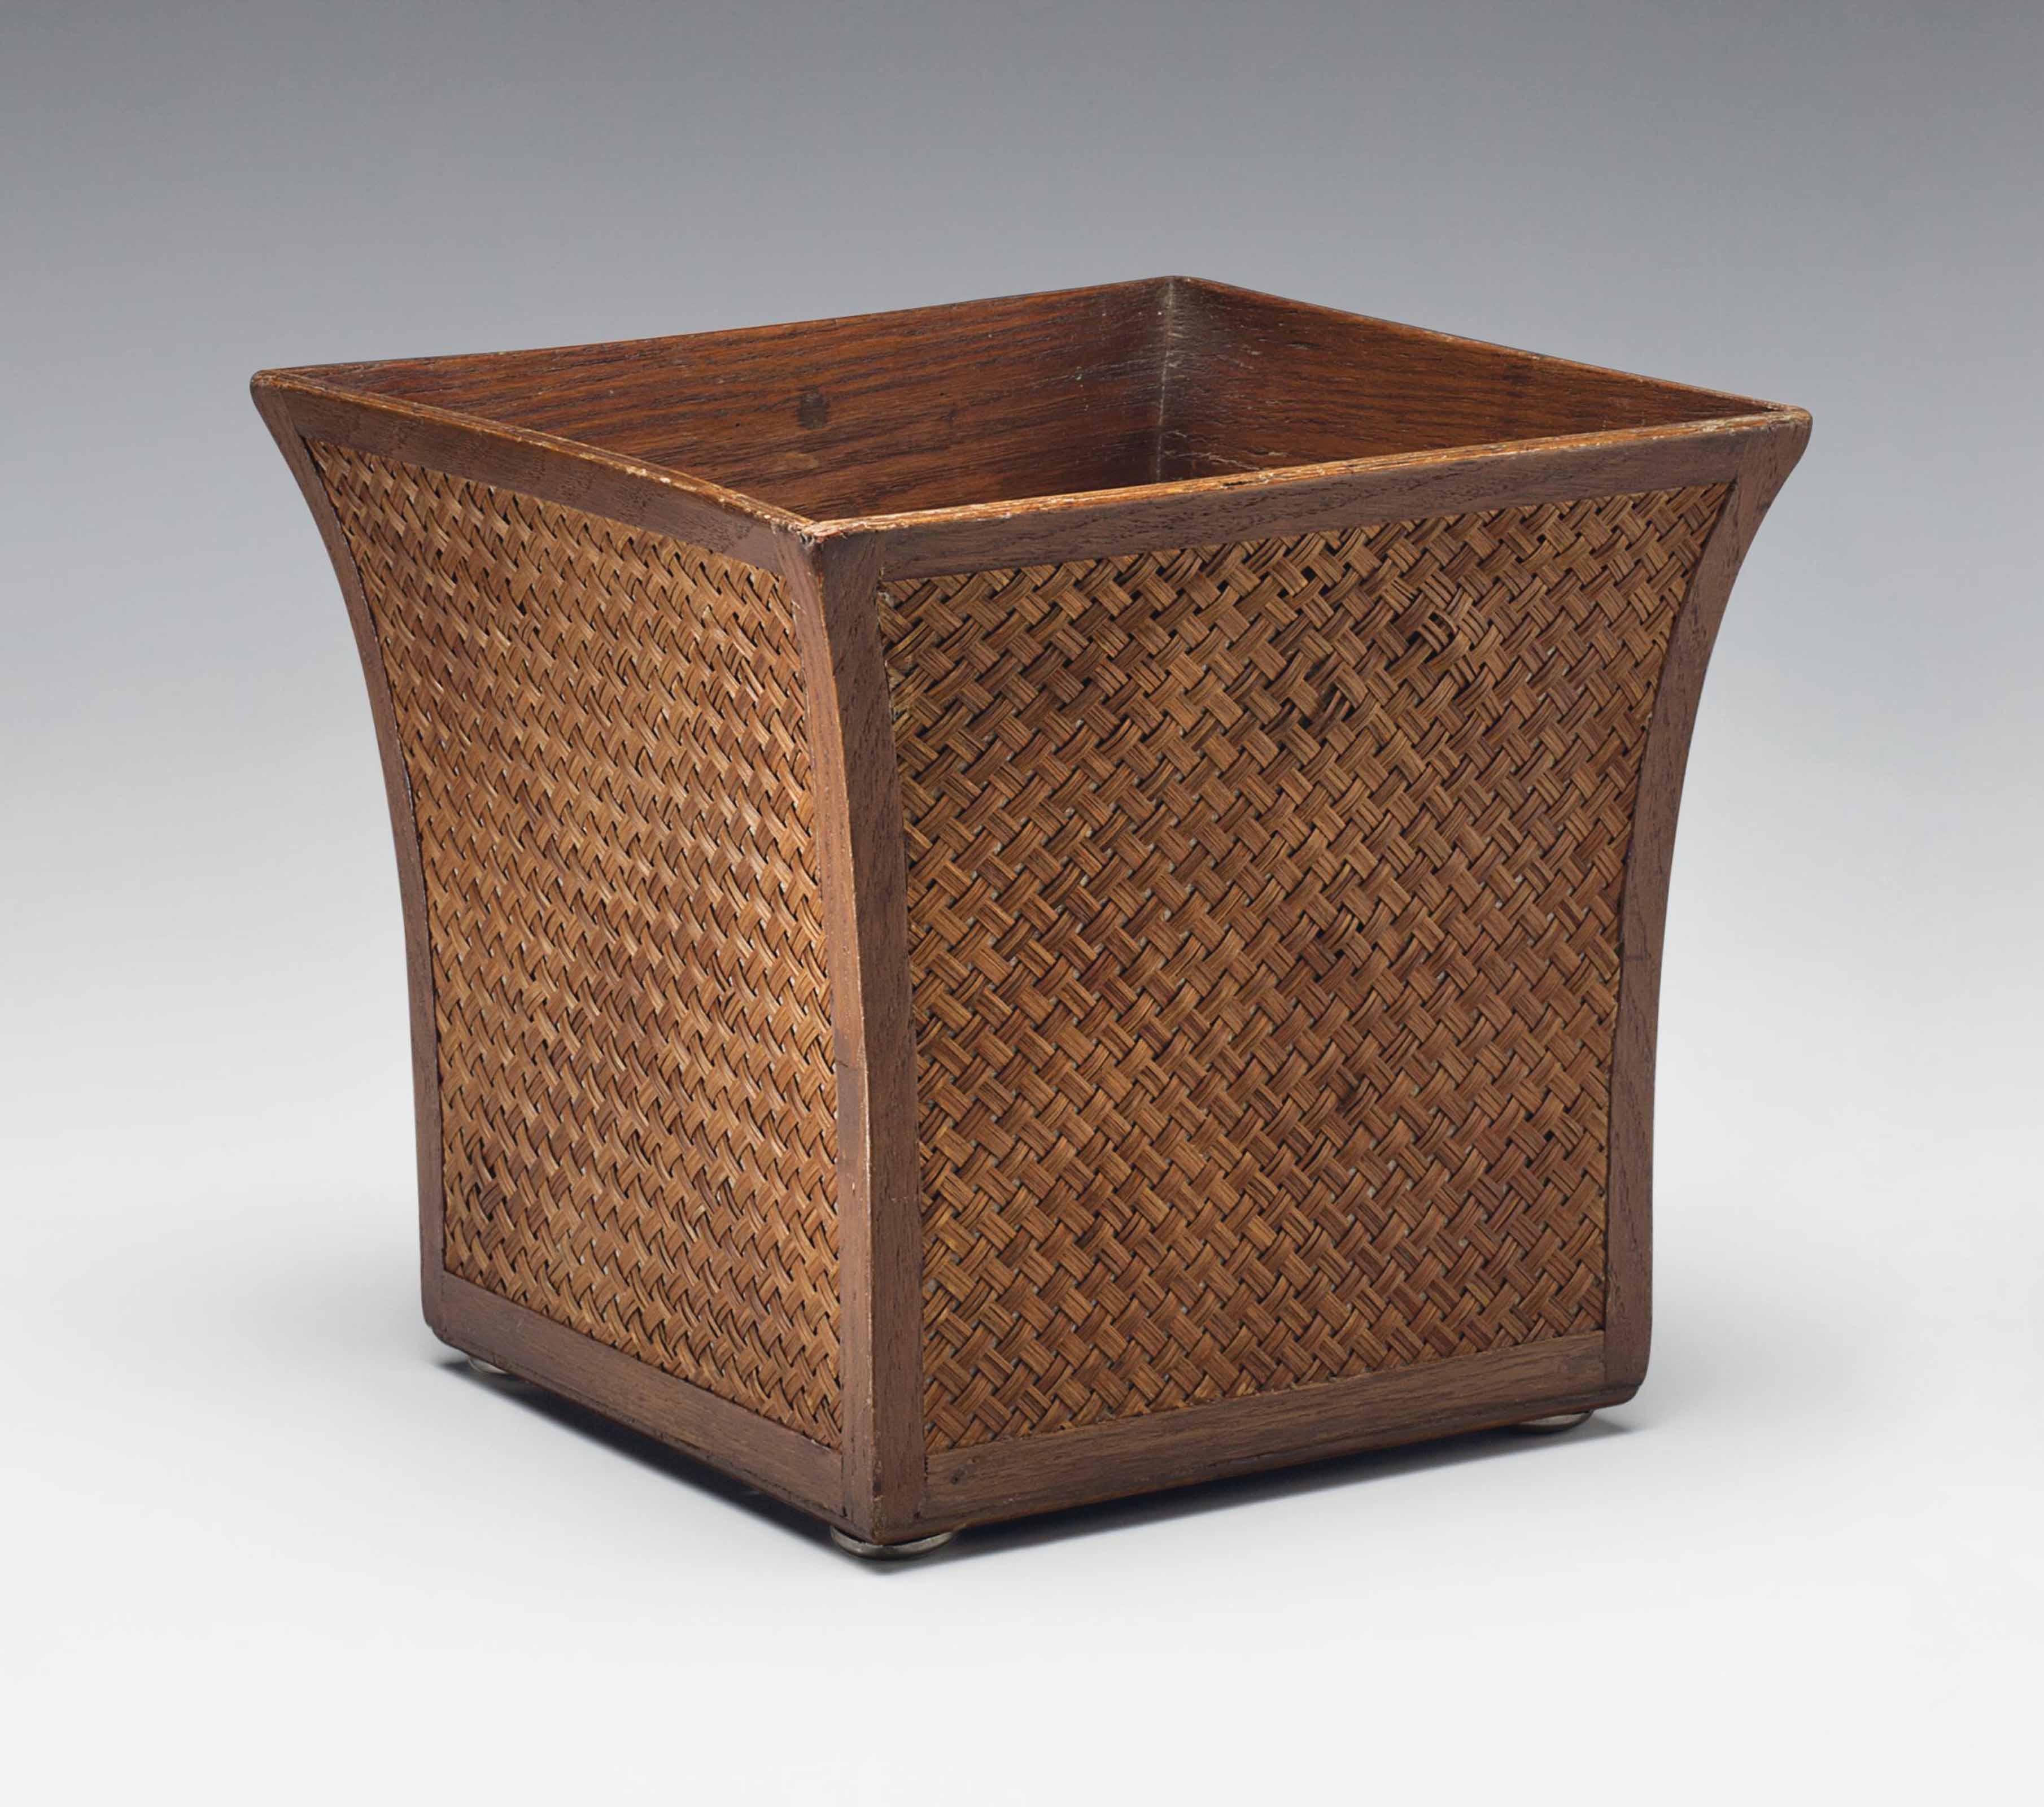 JEAN MICHEL FRANK (1895 1941) | A WASTE BASKET, 1939 | 1930s, Furniture U0026  Lighting | Christieu0027s